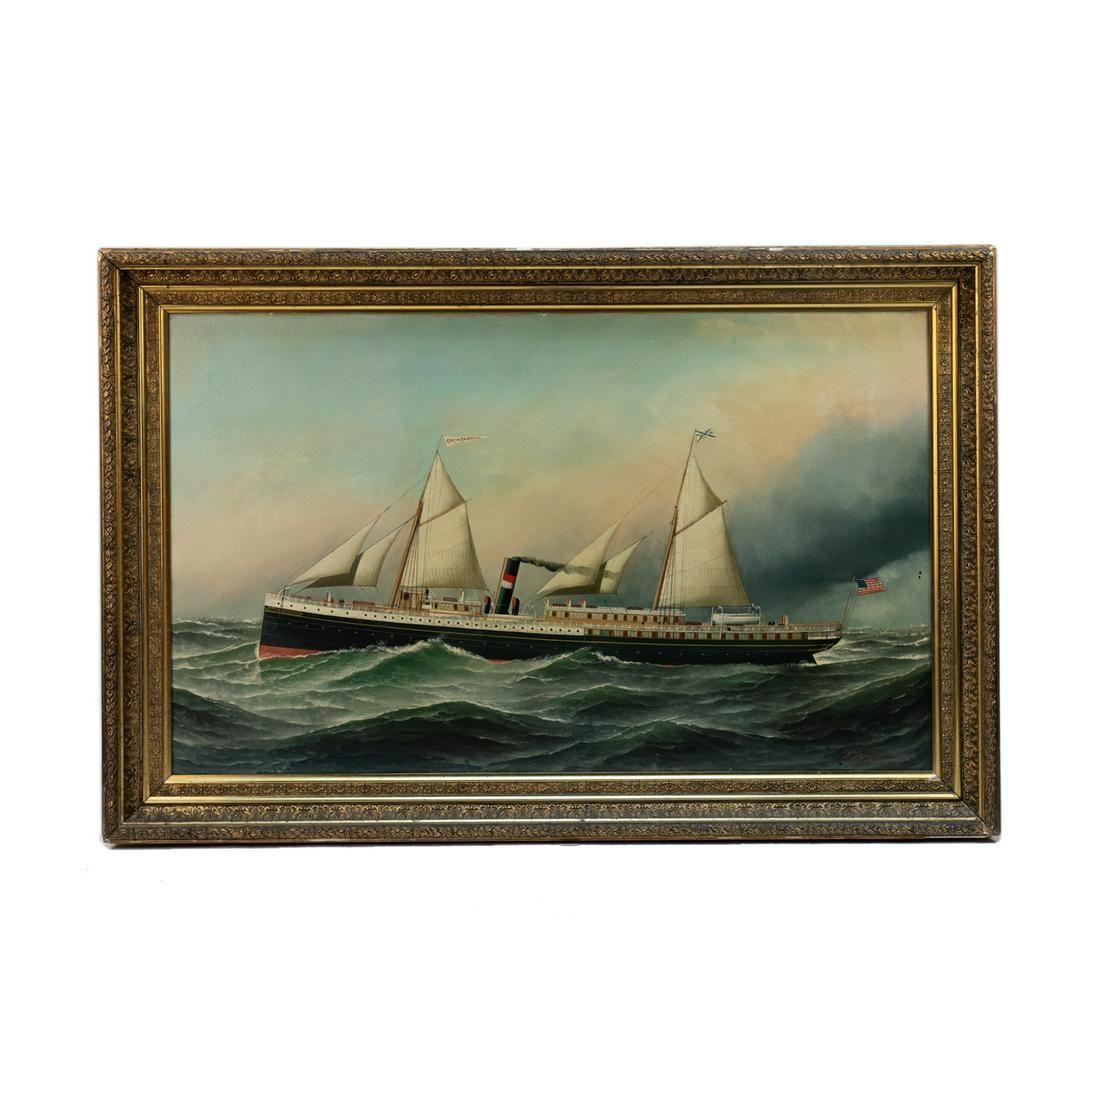 Antonio Jacobsen Signed Oil on Board c. 1889